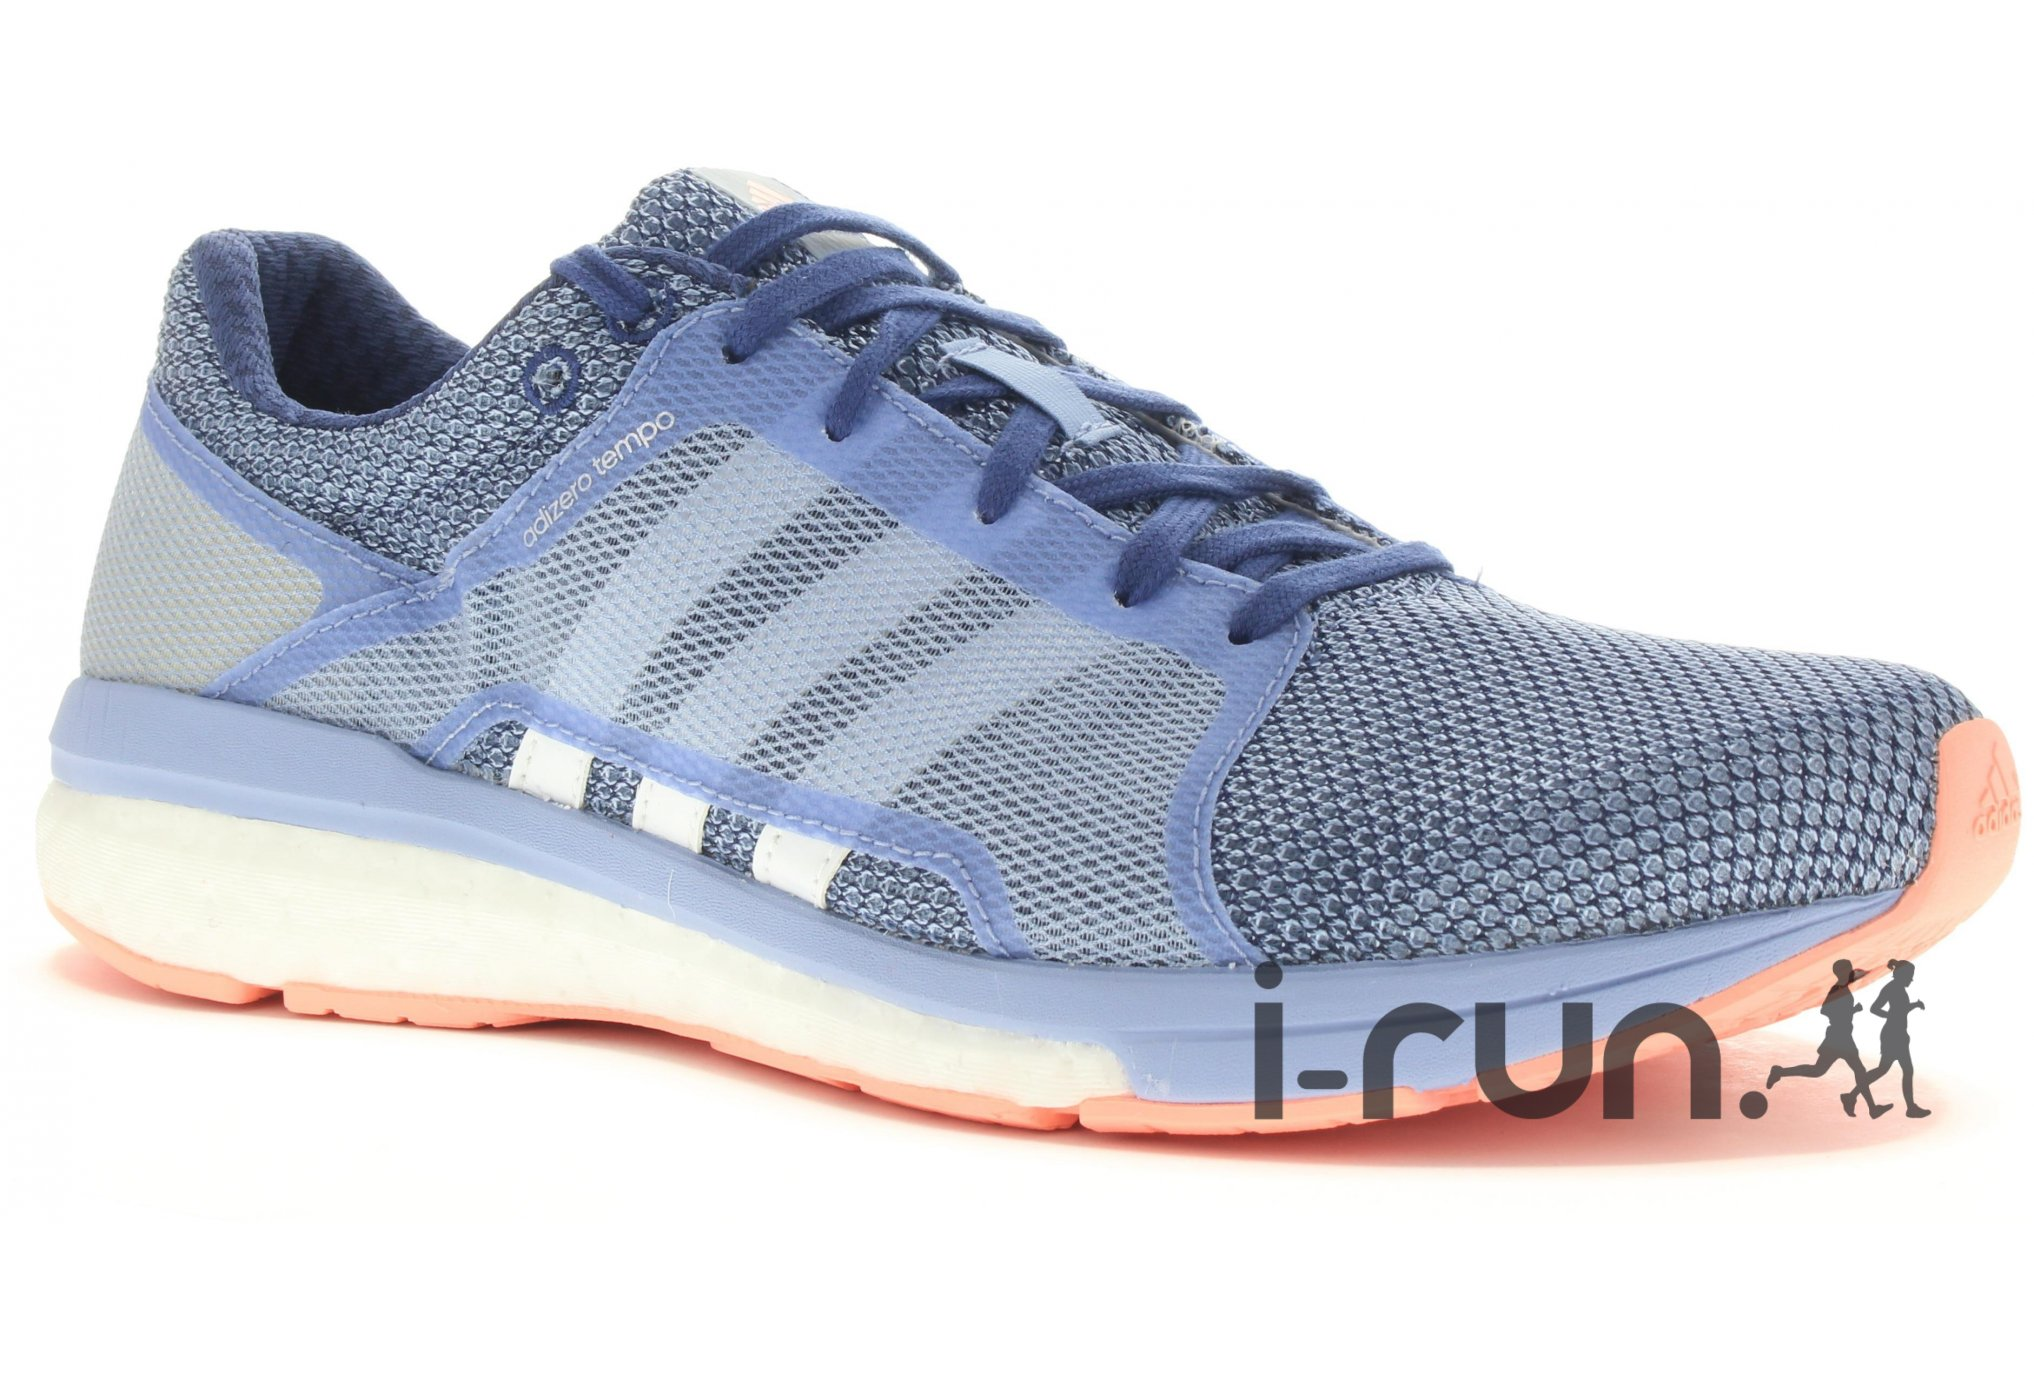 Adidas Adizero tempo 8 ssf w diététique chaussures femme